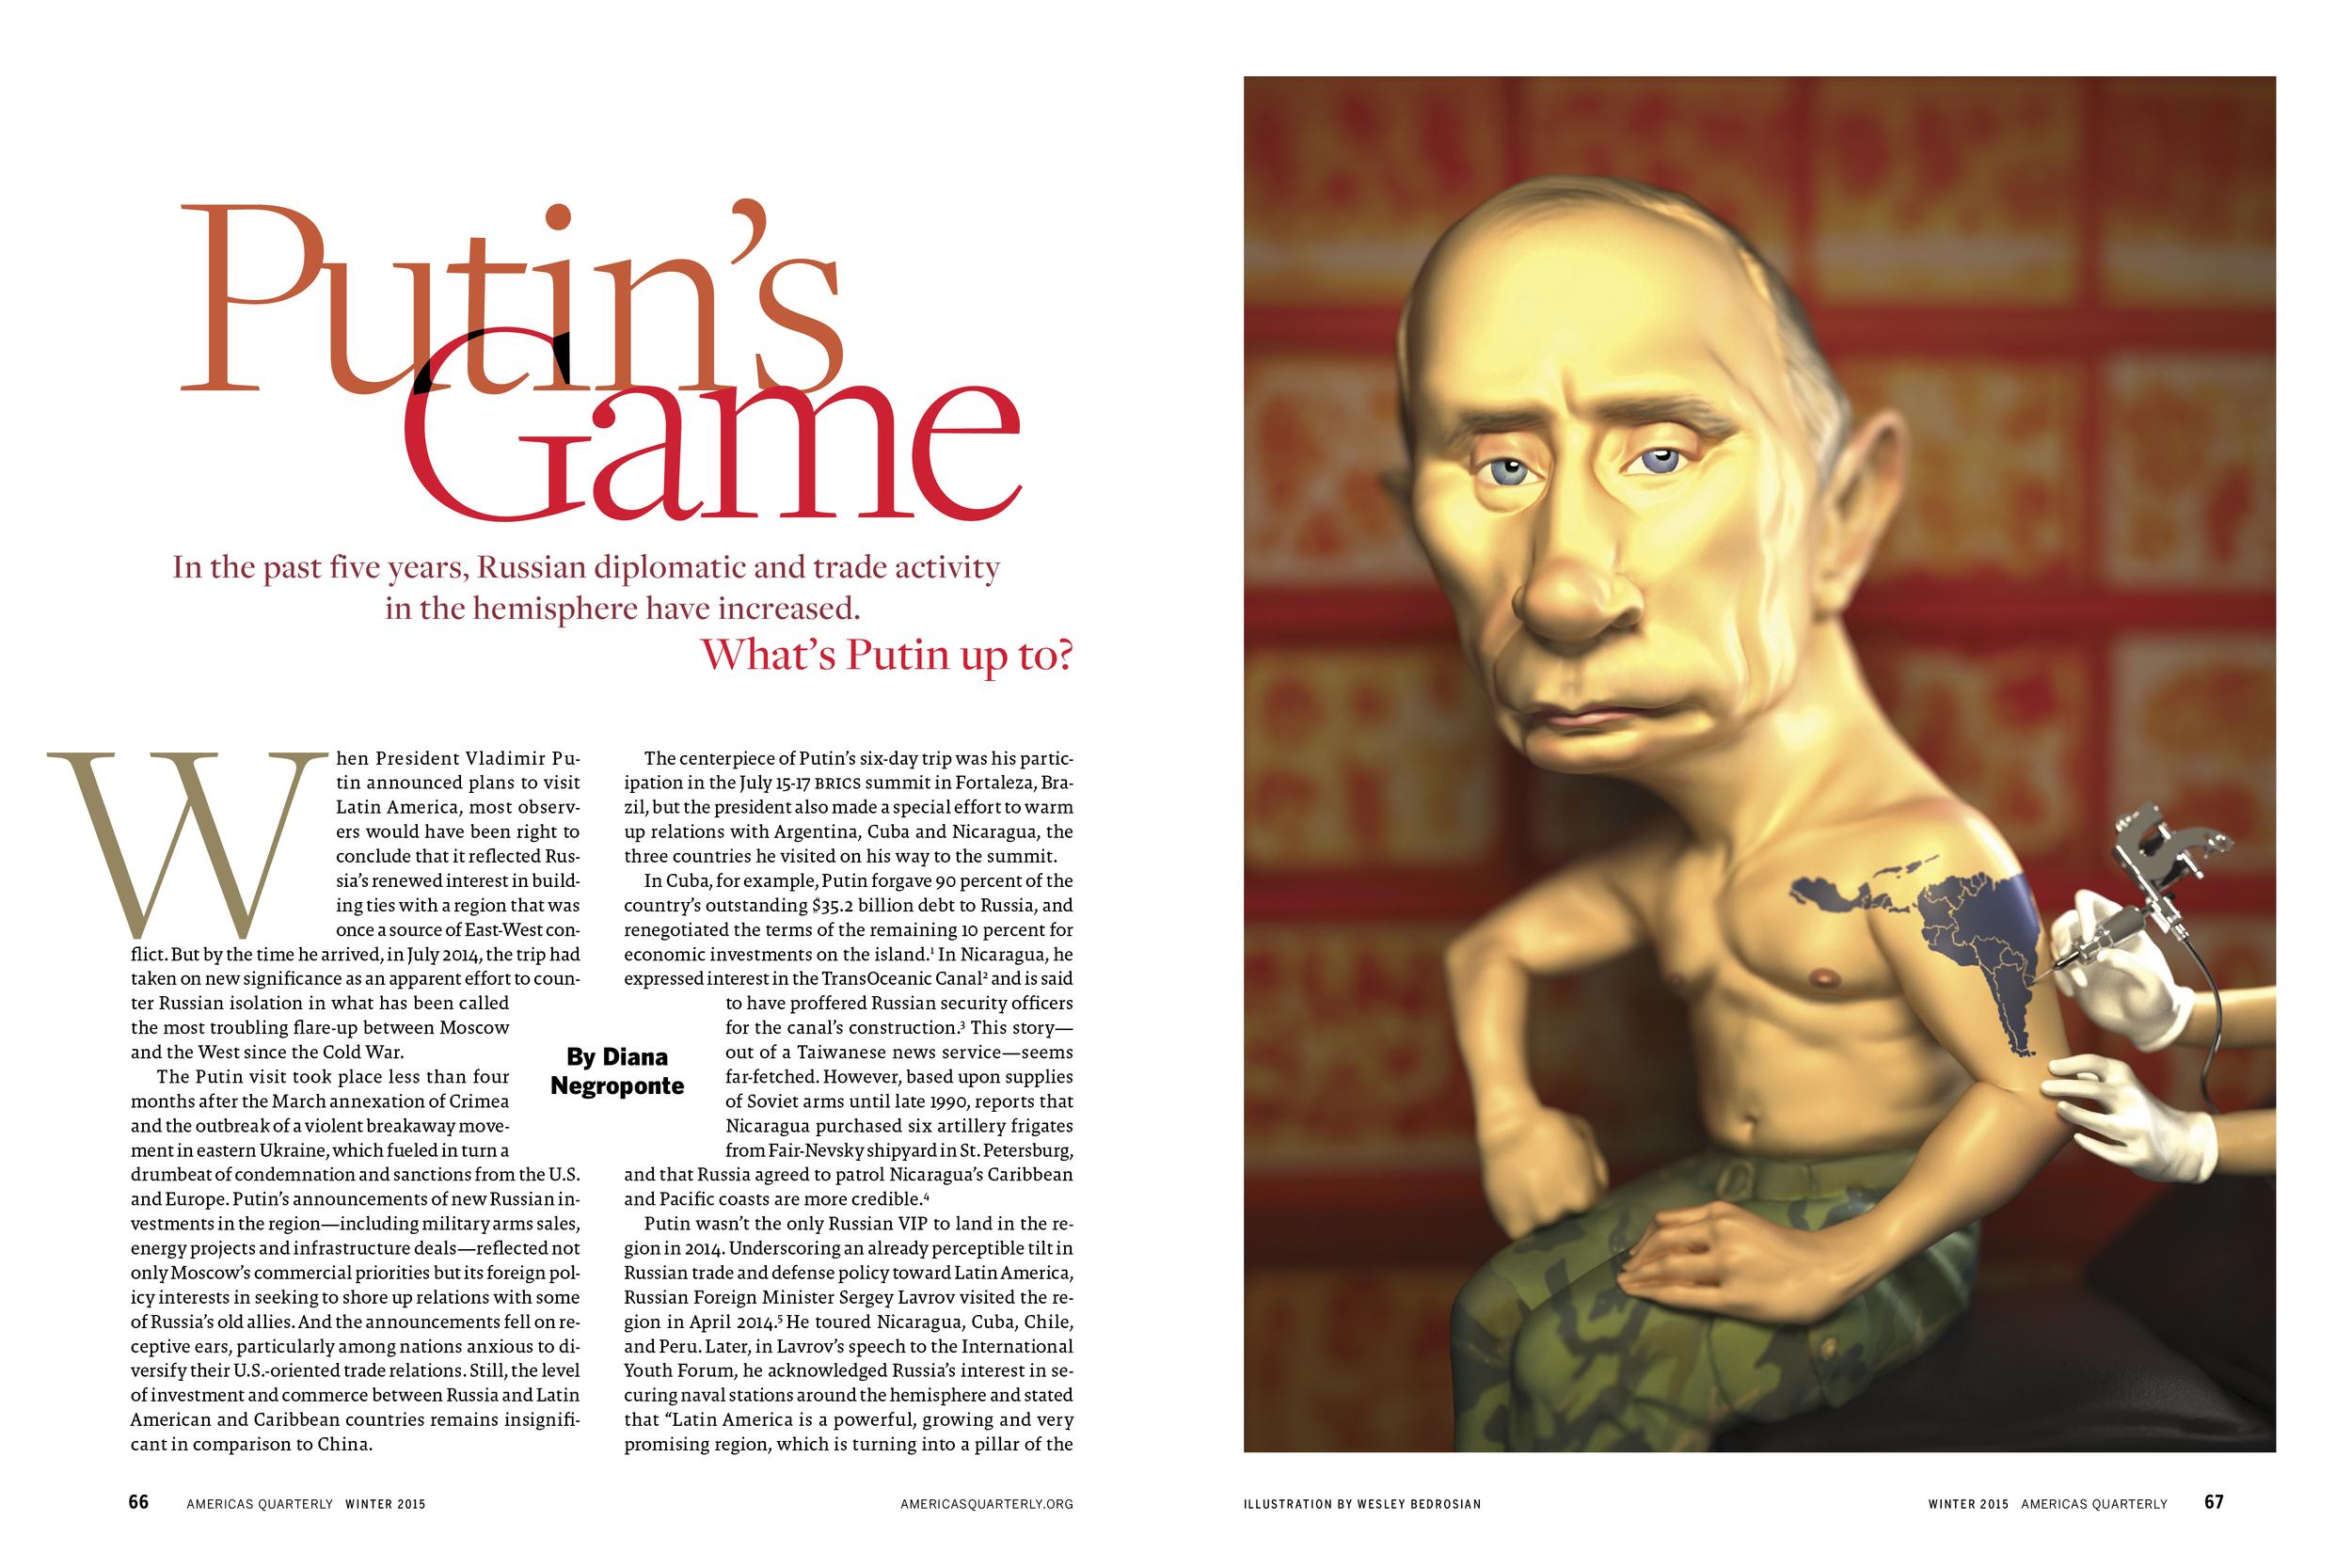 Putin's Game